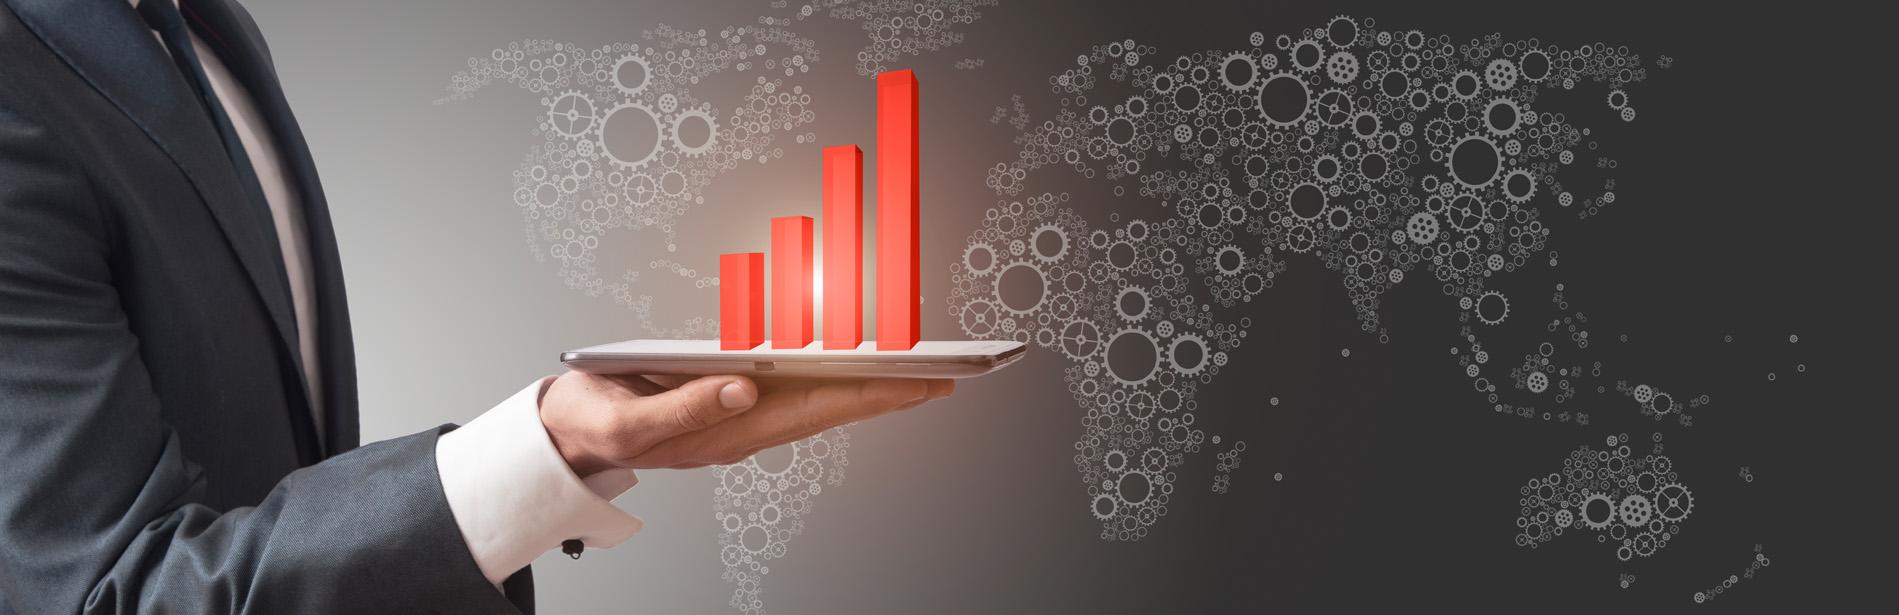 Broad peak investment assets under management forex rates gbp zar